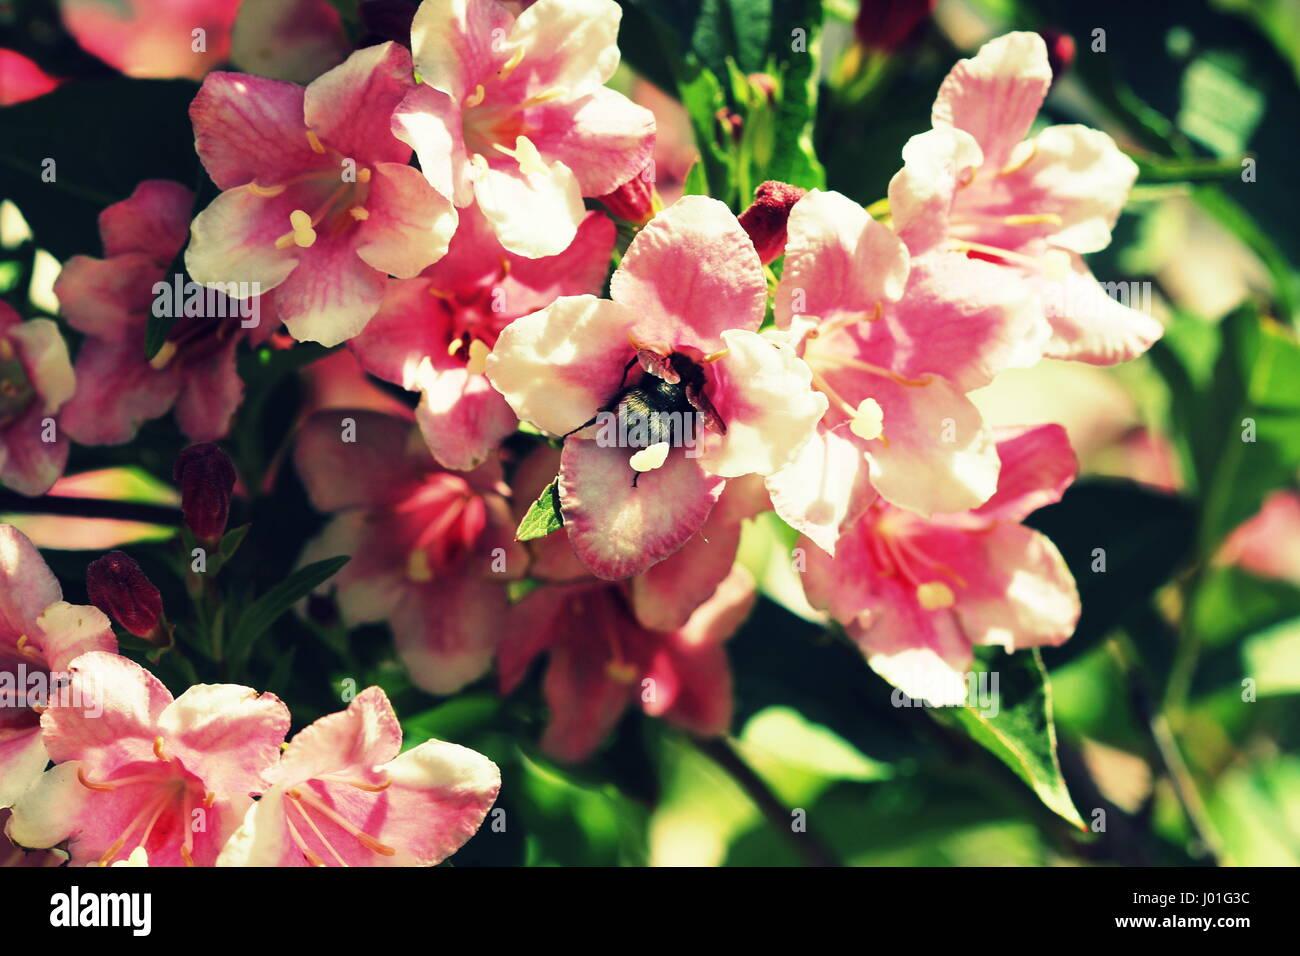 Blooming pink flower Weigela. Bee pollinated flower. - Stock Image